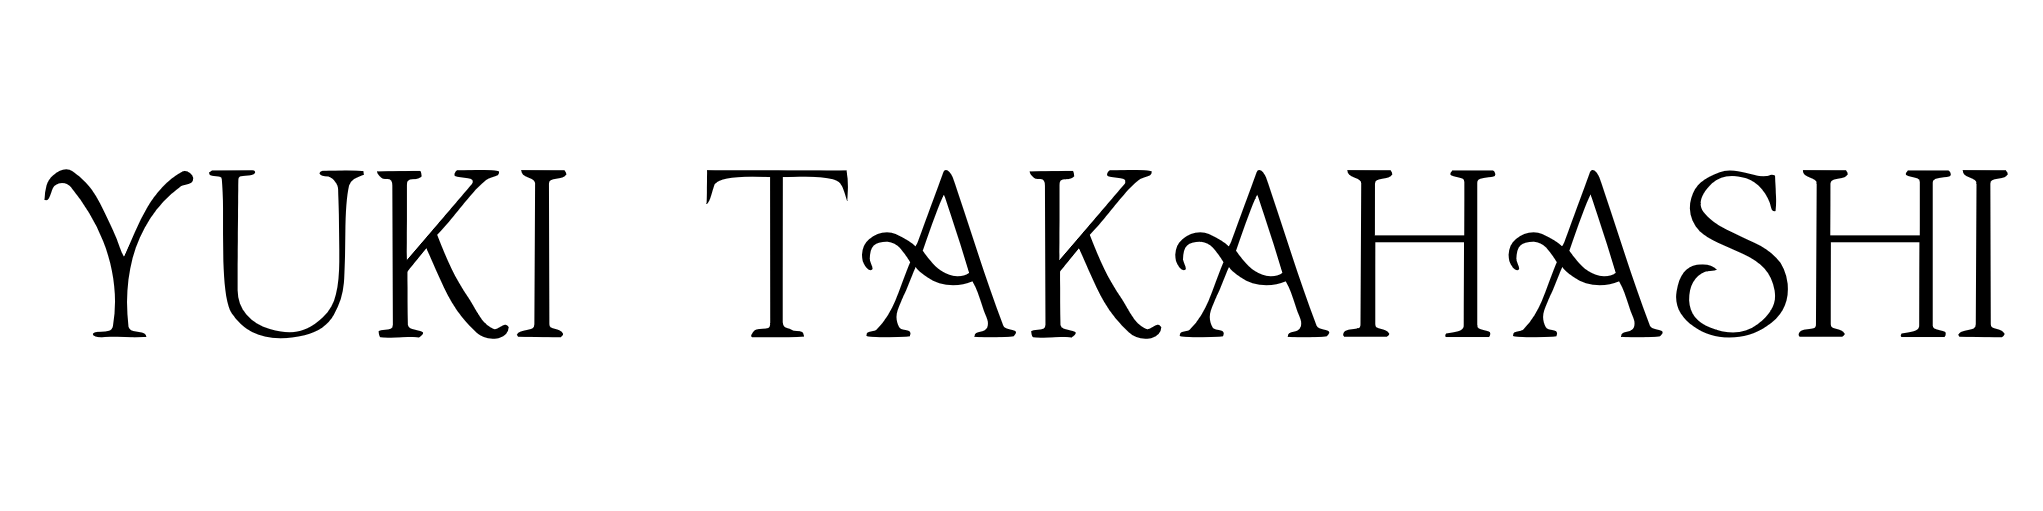 YukiTakahashi